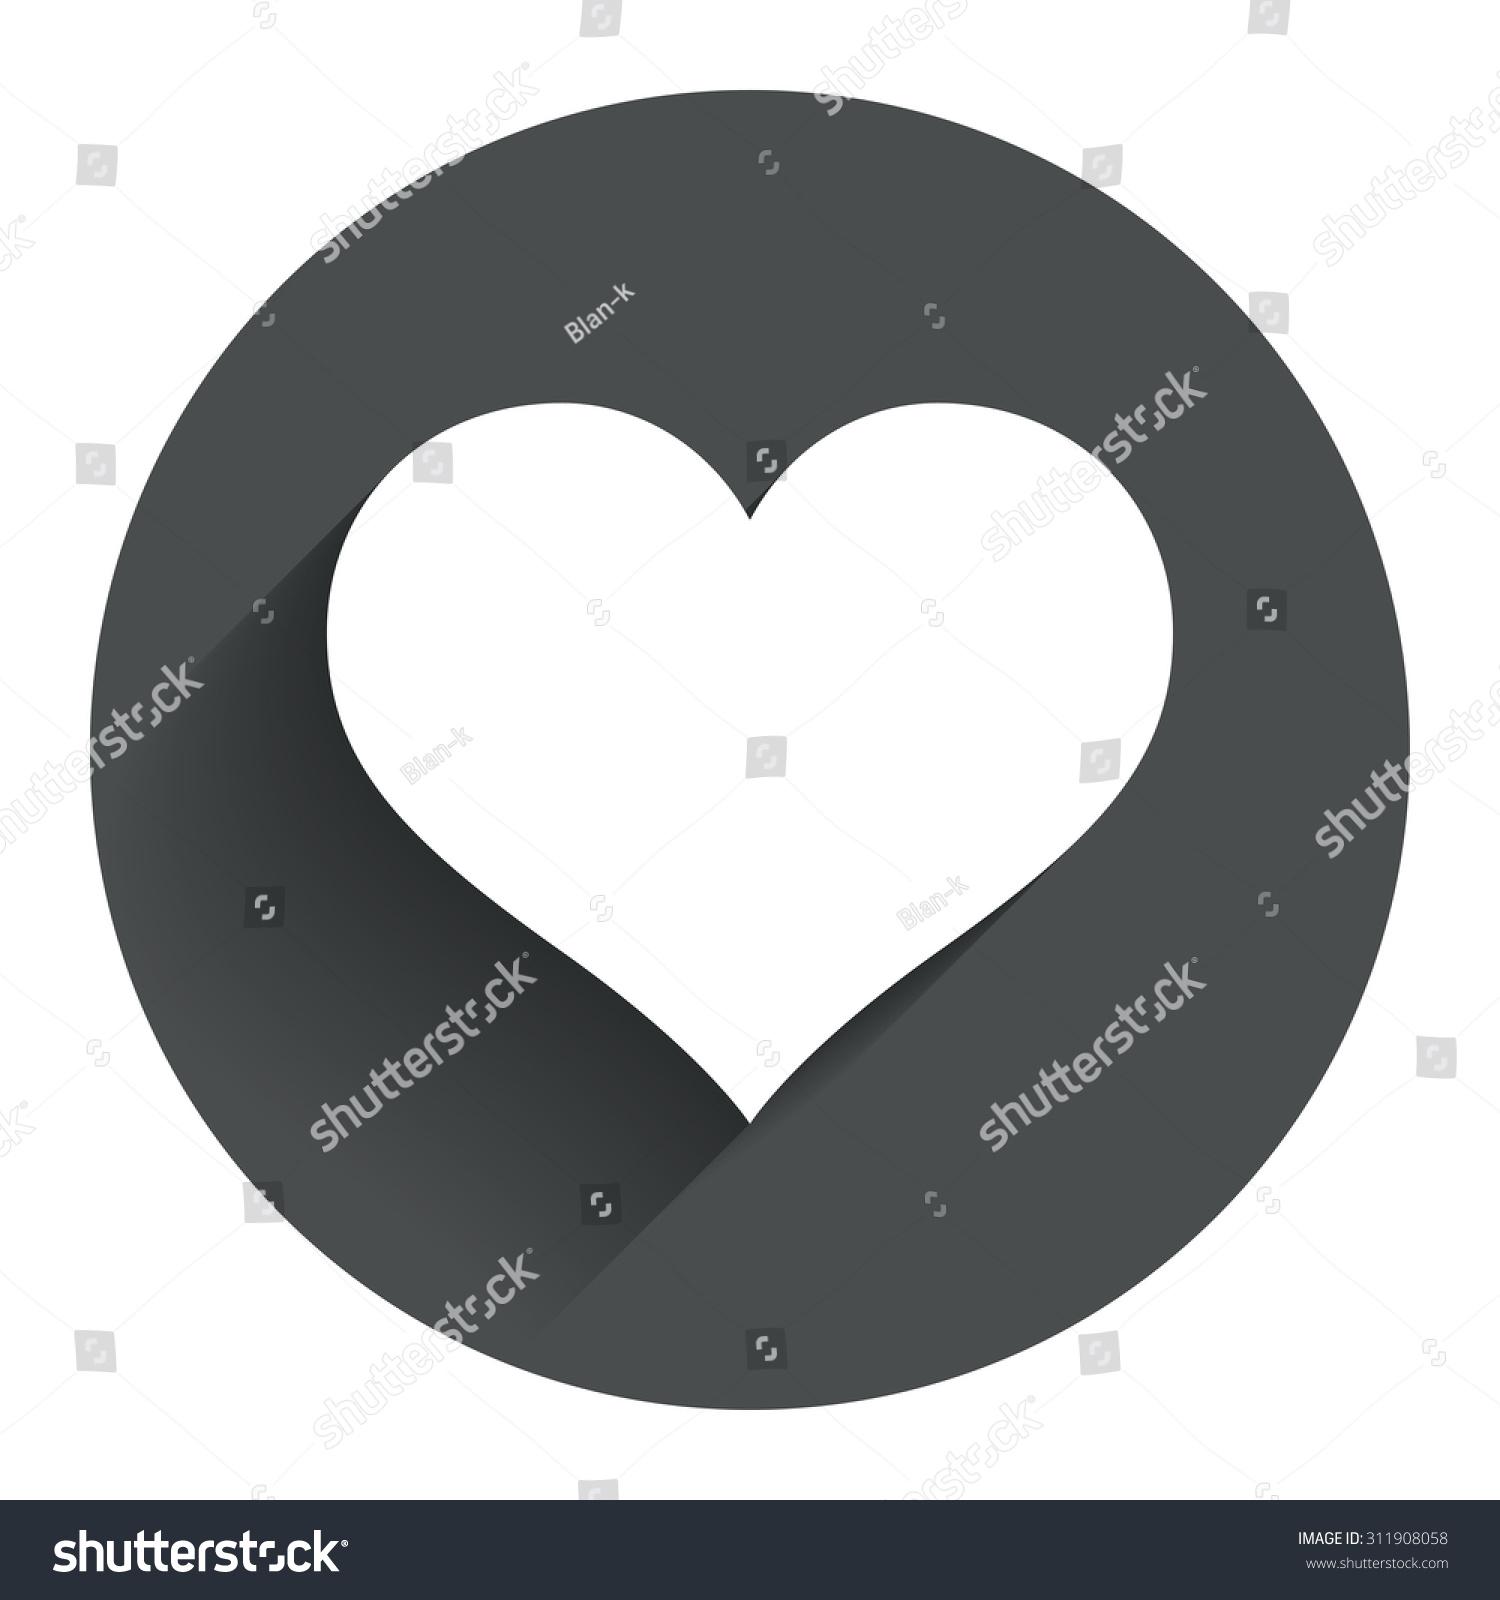 Love icon heart sign symbol circle stock vector 311908058 love icon heart sign symbol circle stock vector 311908058 shutterstock buycottarizona